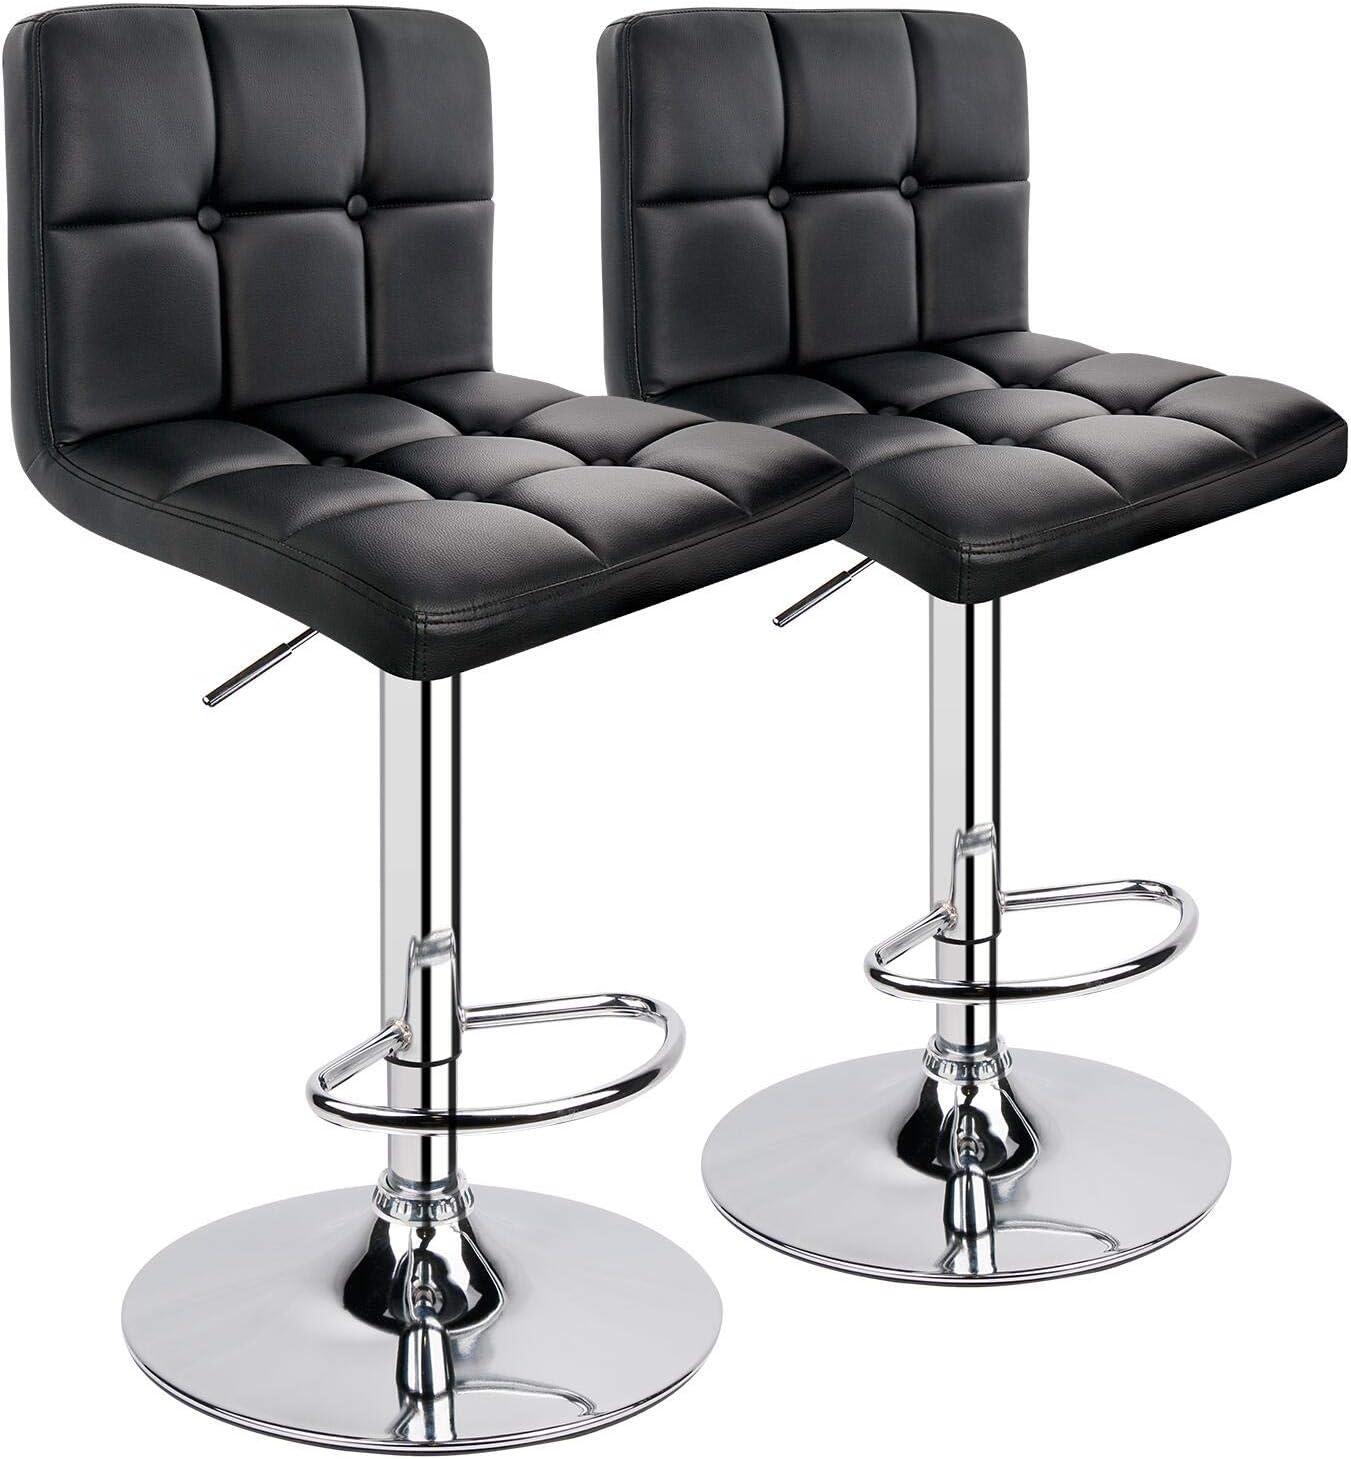 HOMEKOKO Modern Adjustable Barstools, Square Counter Height Stool, Swivel Leather Bar stools Set of 2, Black